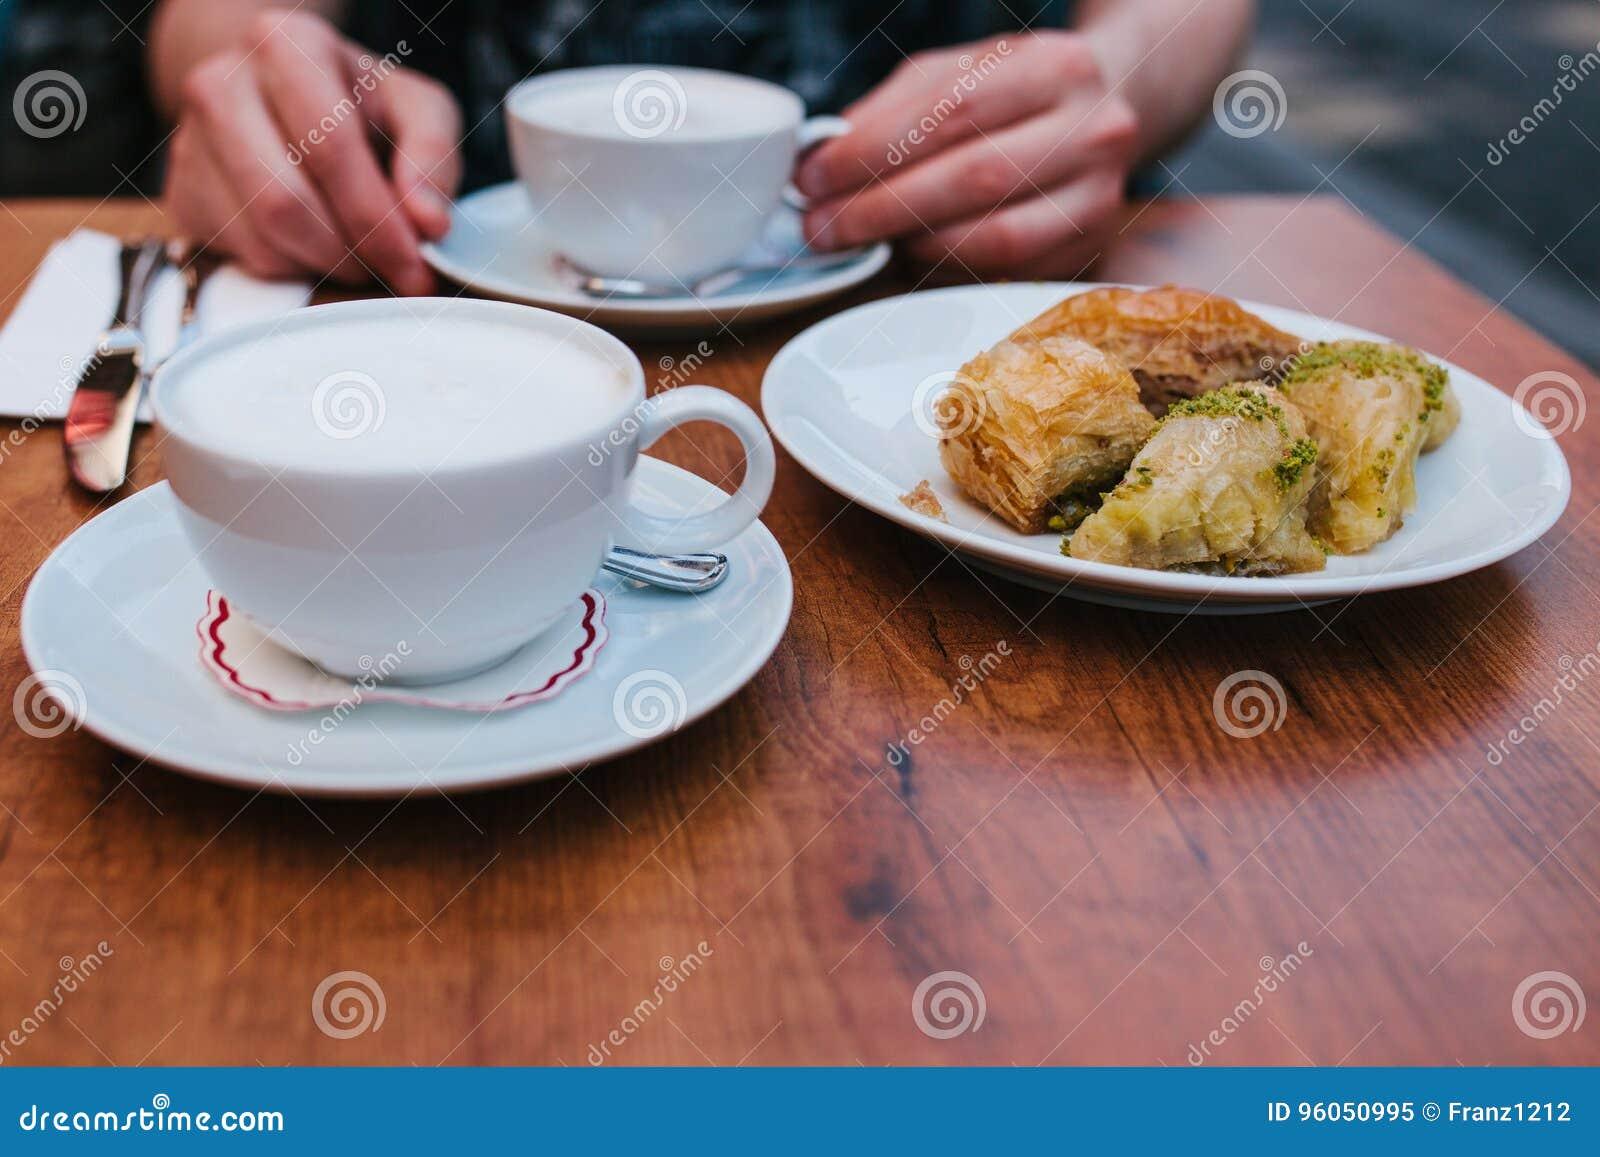 Картинки на аву девушка с кофе